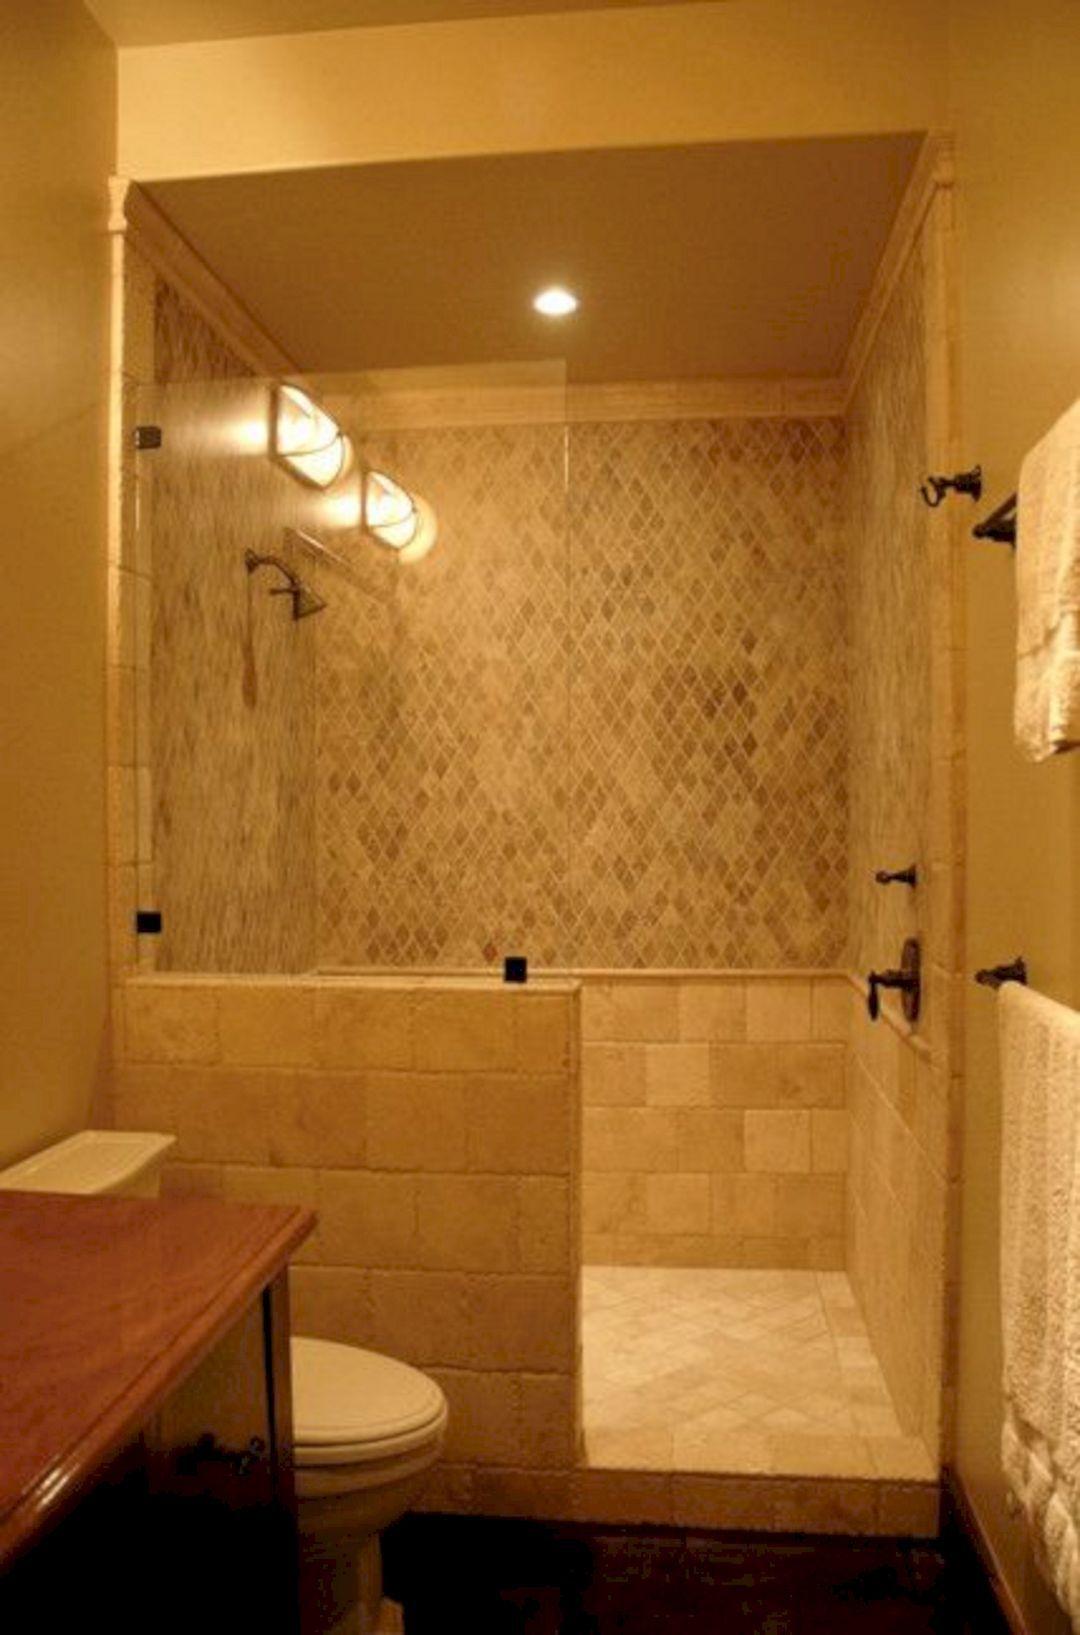 Adorable 25 Small Bathroom Shower Doorless Design Ideas Freshouz Com Mediterranean Bathroom Small Bathroom With Shower Bathroom Shower Design